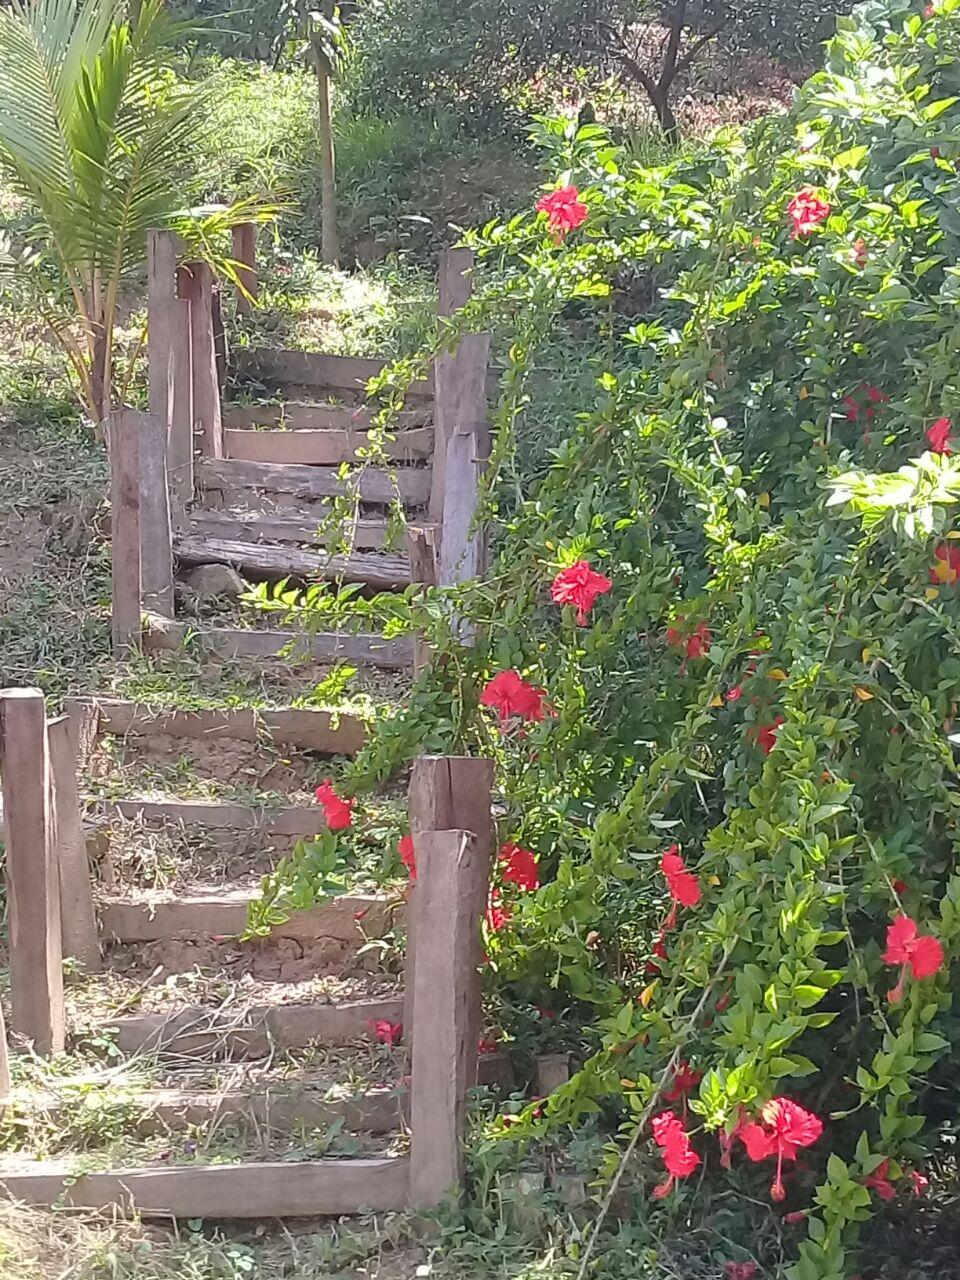 Vagamundos:  Caminar, deambular, descubrir